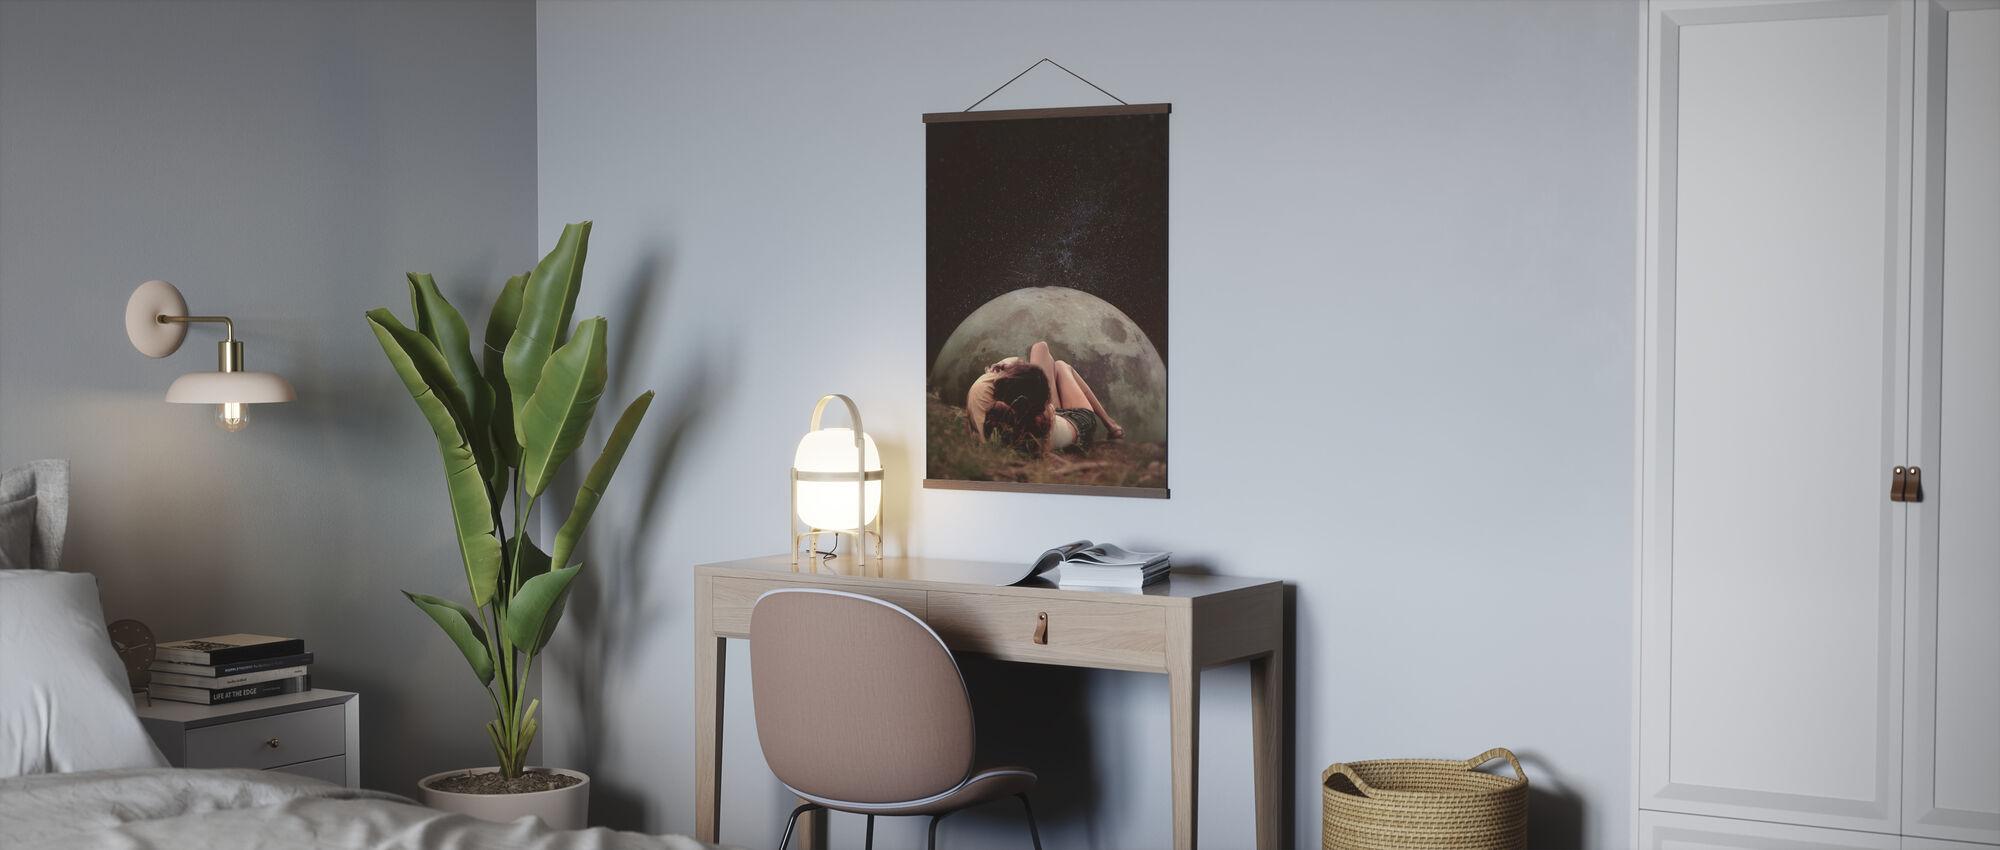 Cosmic Love - Poster - Office